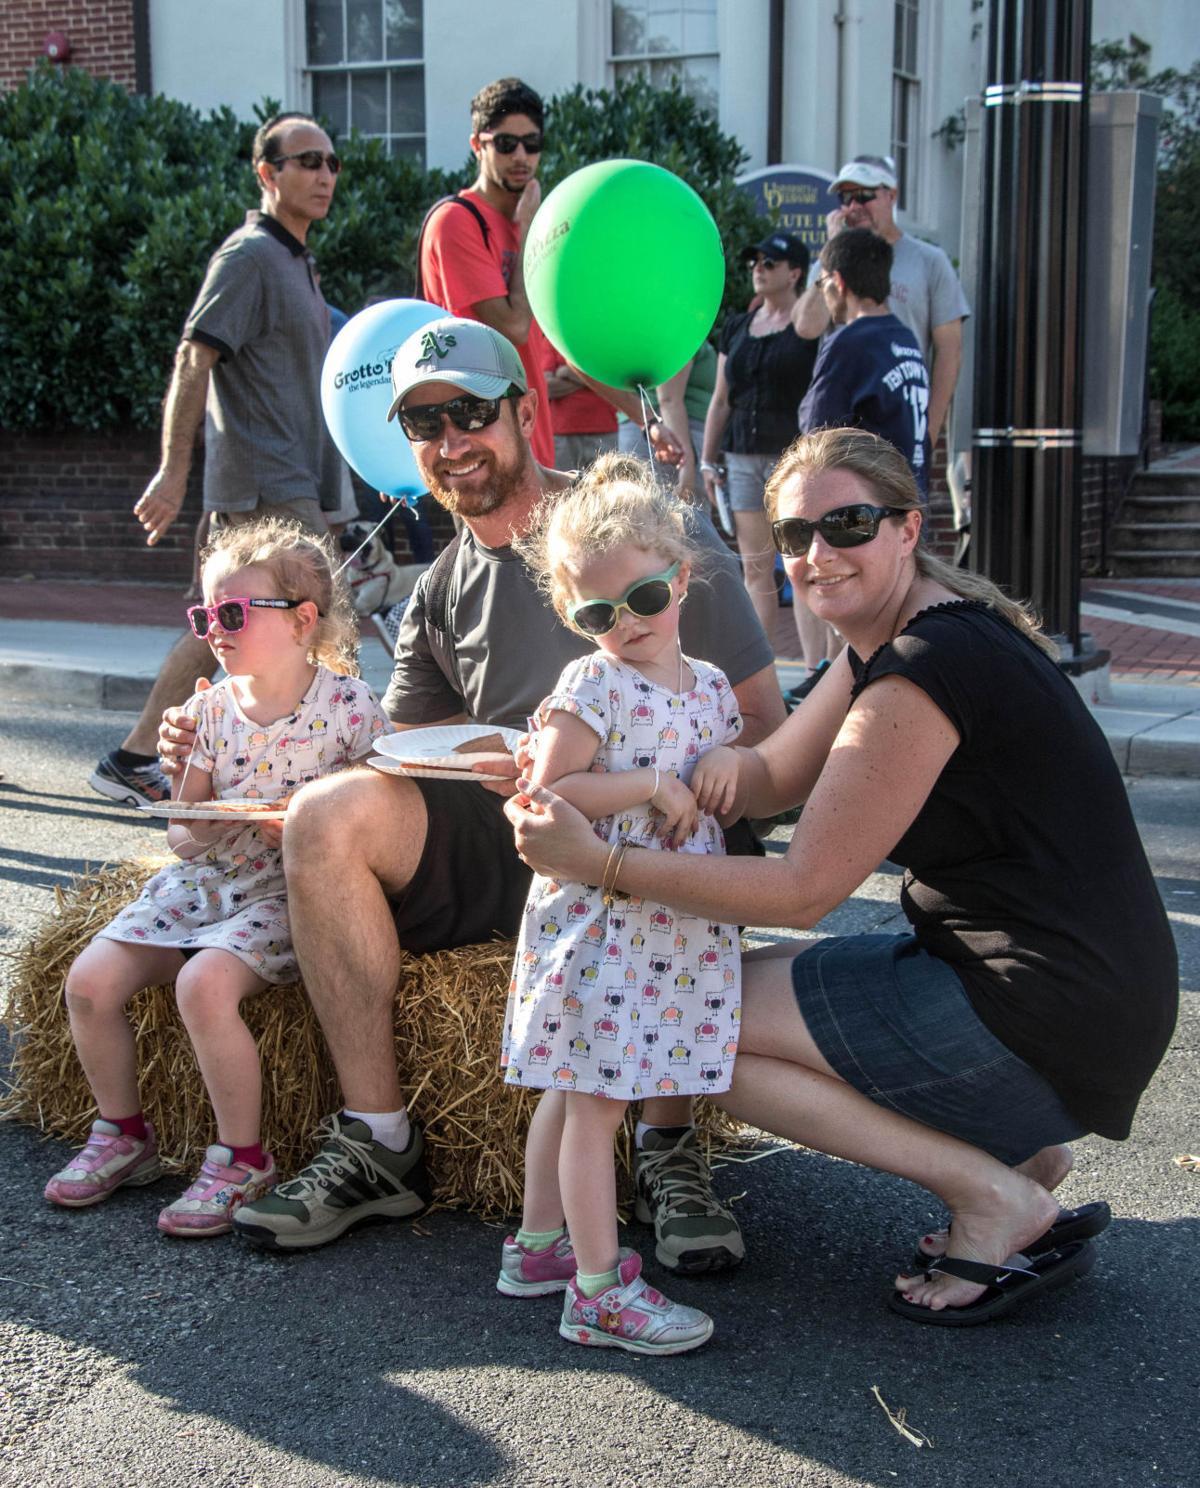 New Night Festival Draws Thousands